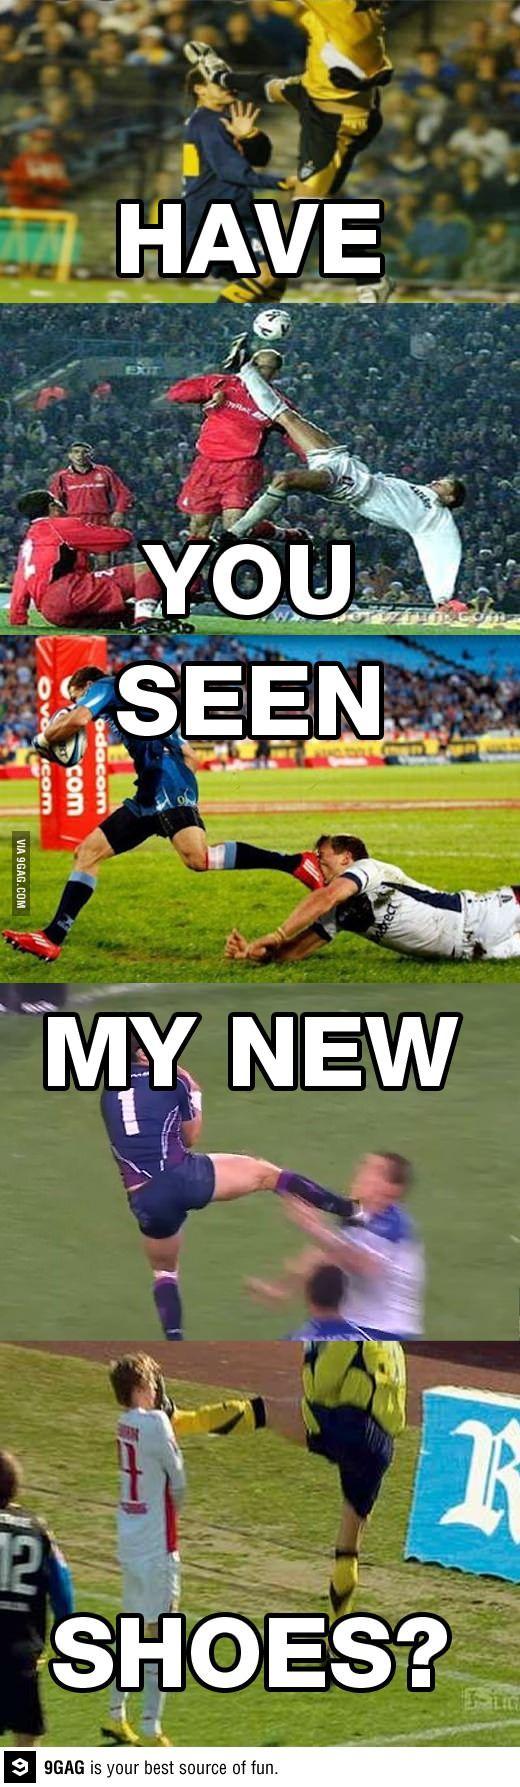 Ouch!!!!!! I am sorry but these are so funny!! Hahahahhahahahahaha